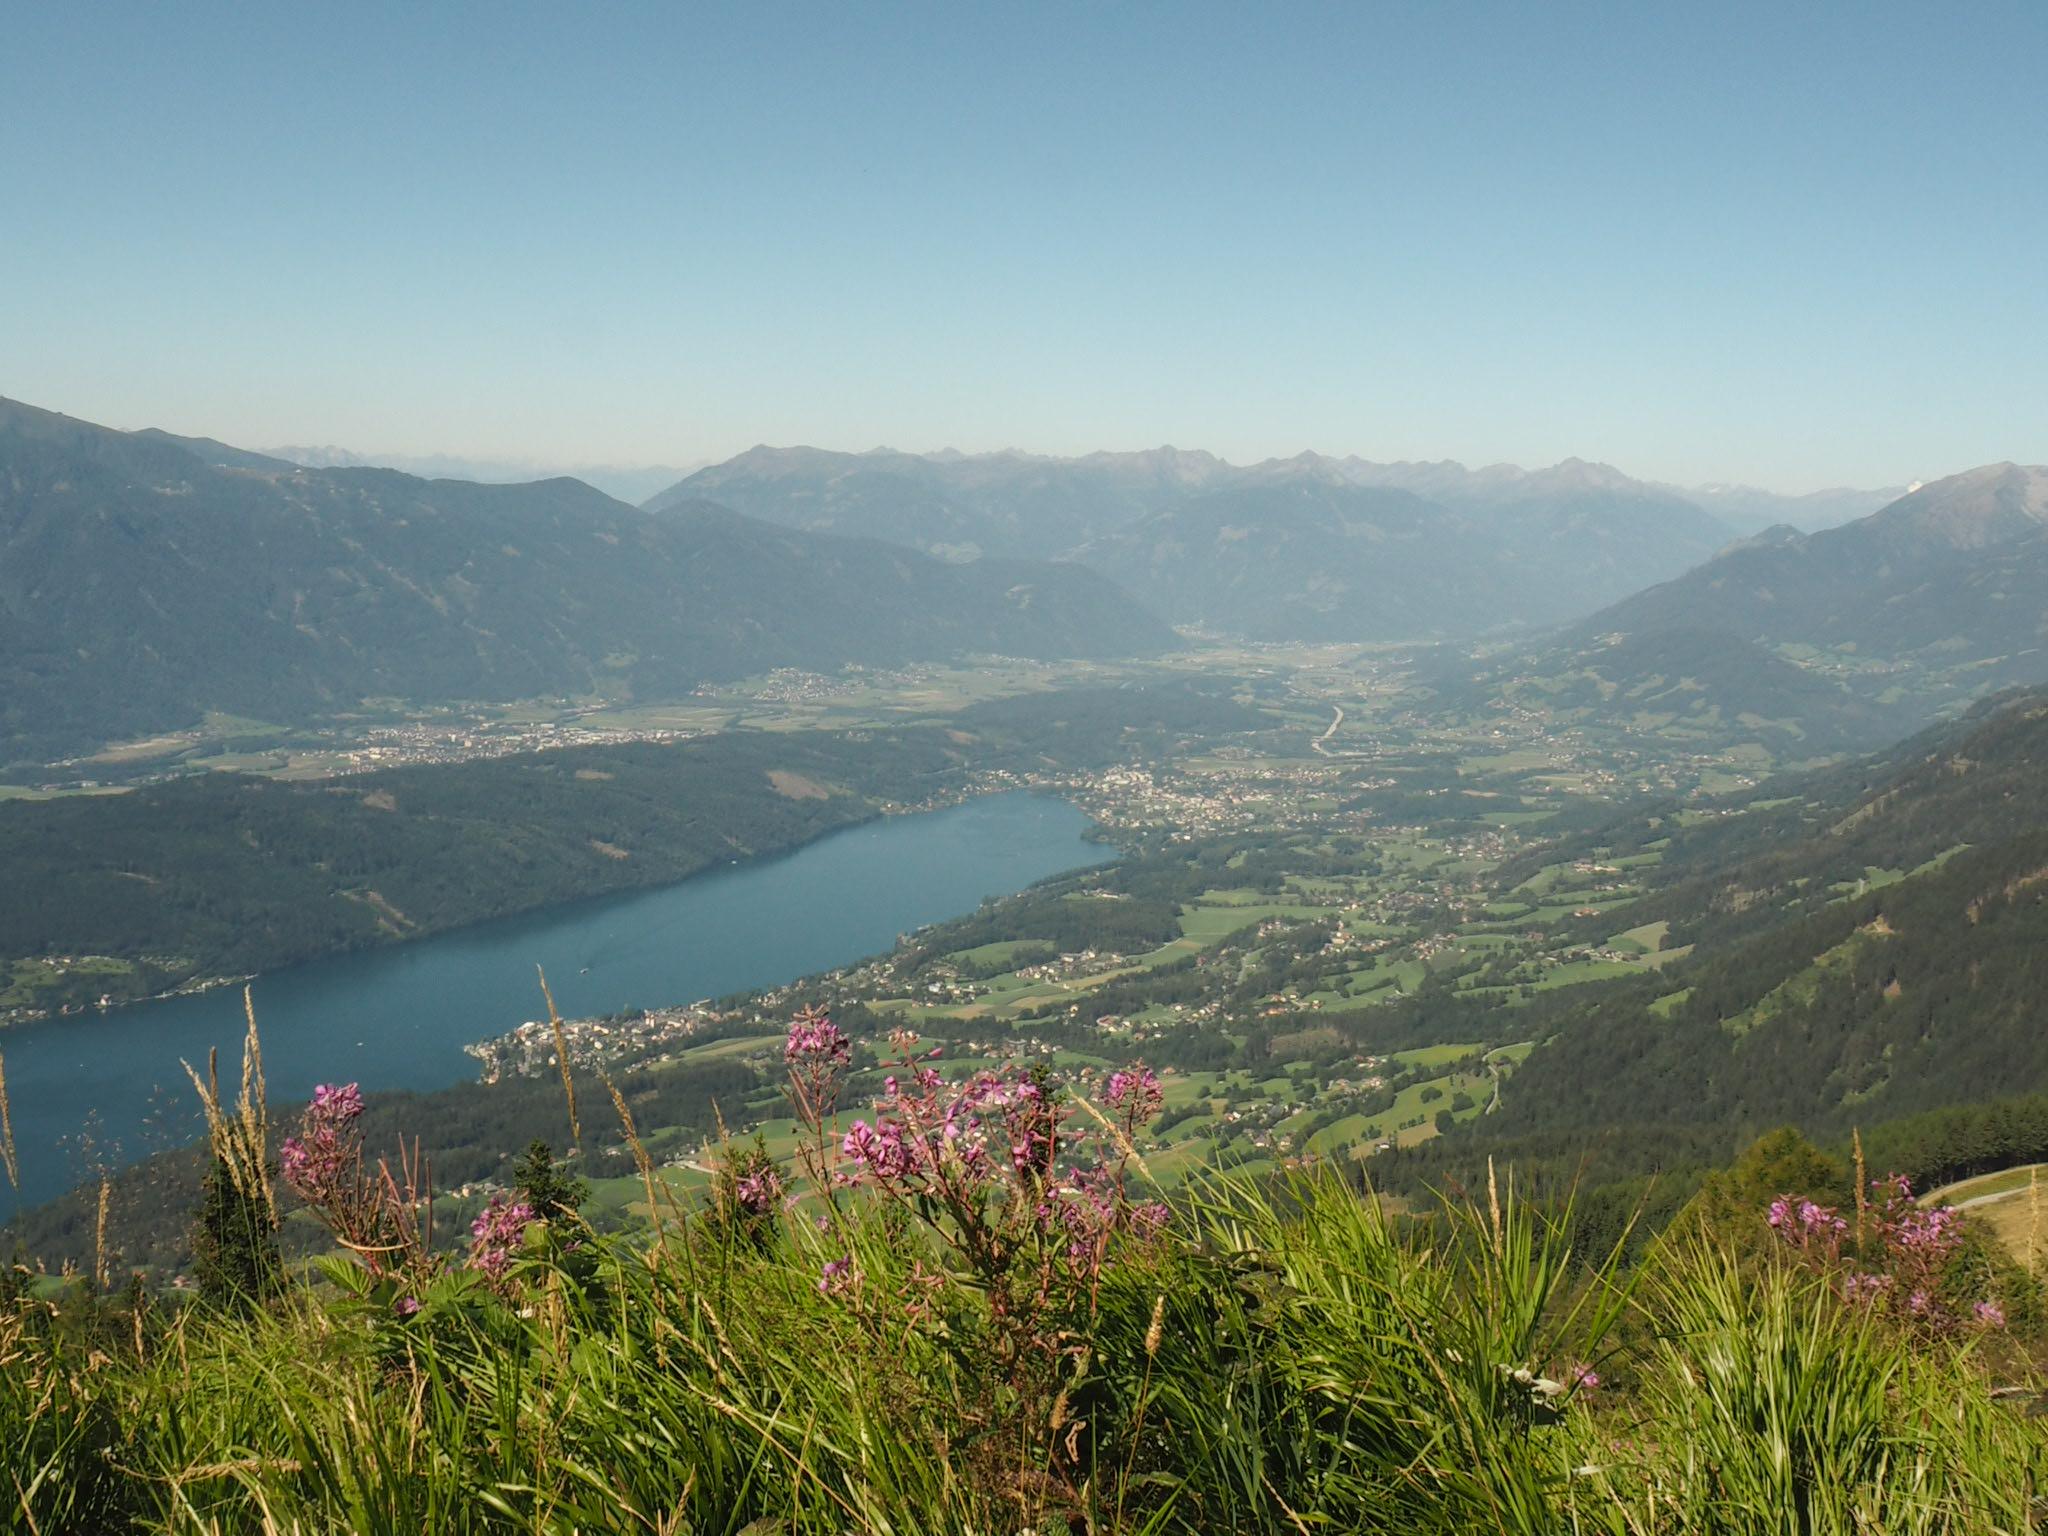 View over Millstatt and Seeboden